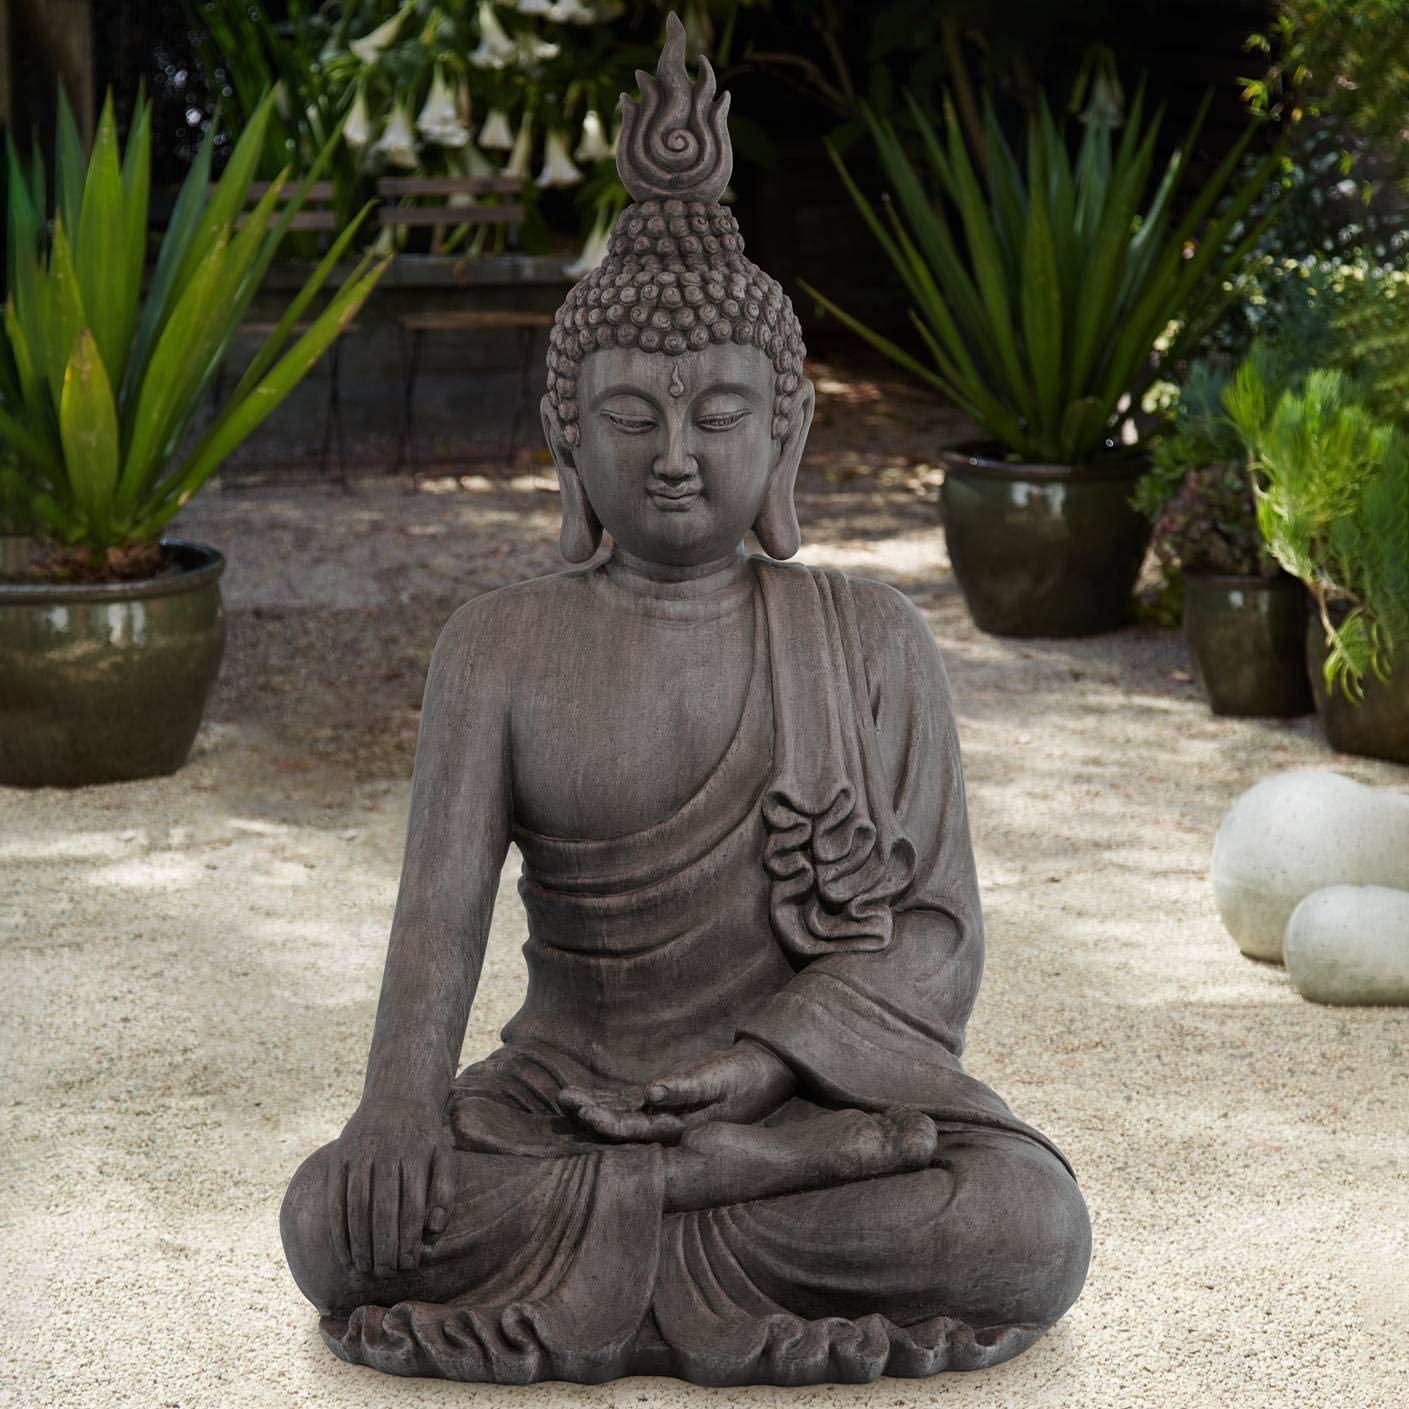 large-garden-buddha-statue-intricate-detail-lightweight-resin-ceramic-coating-big-sculpture-for-outdoor-meditation